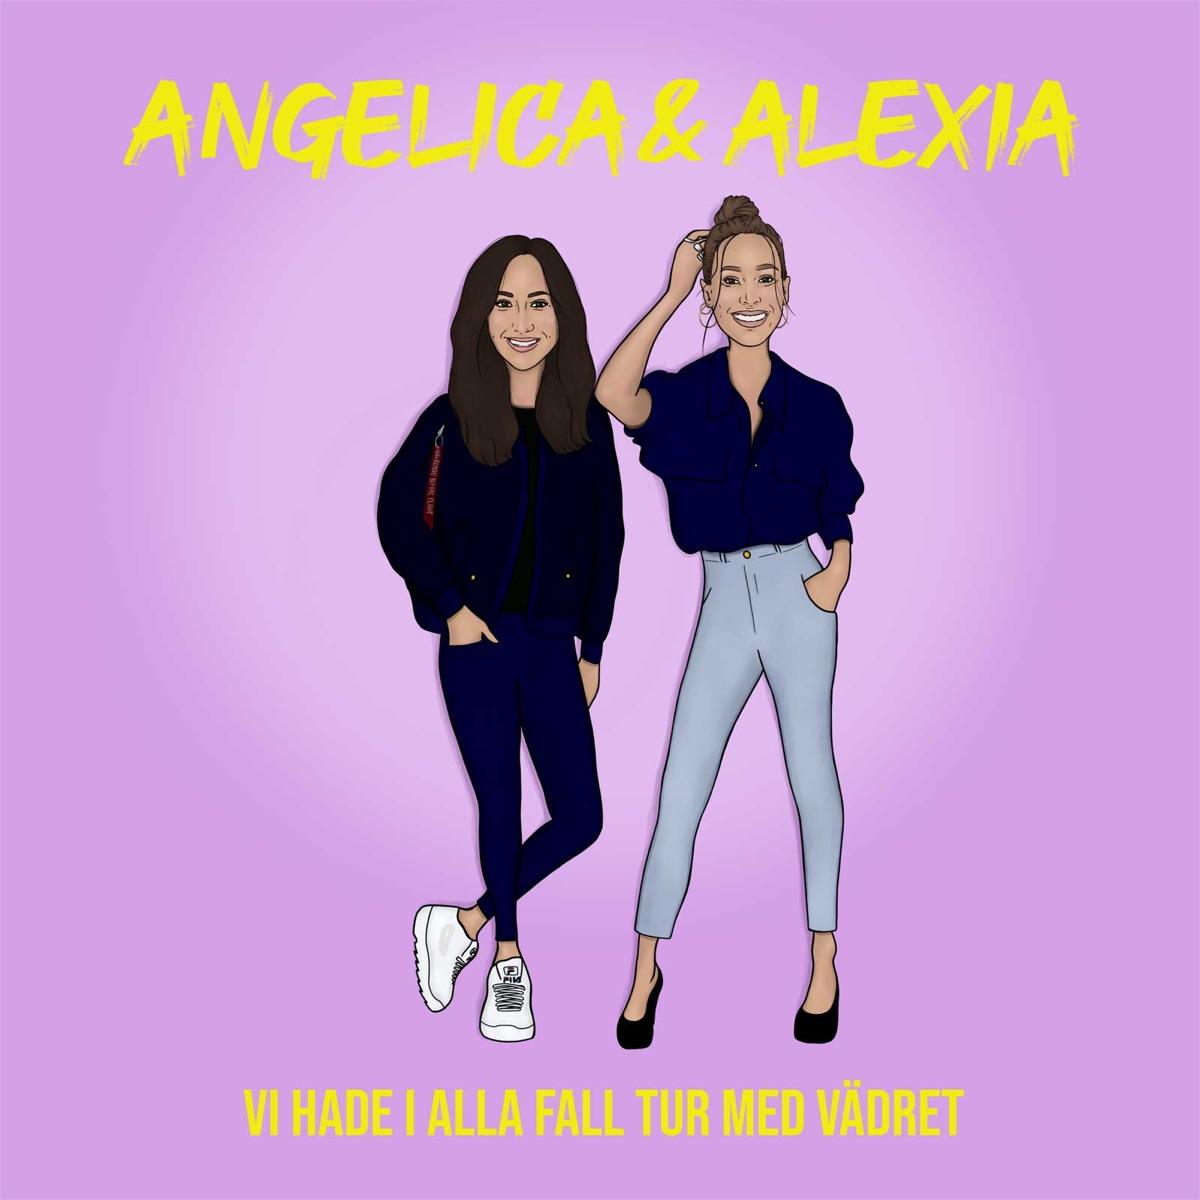 Angelica & Alexia - Vi hade i alla fall tur med vädret